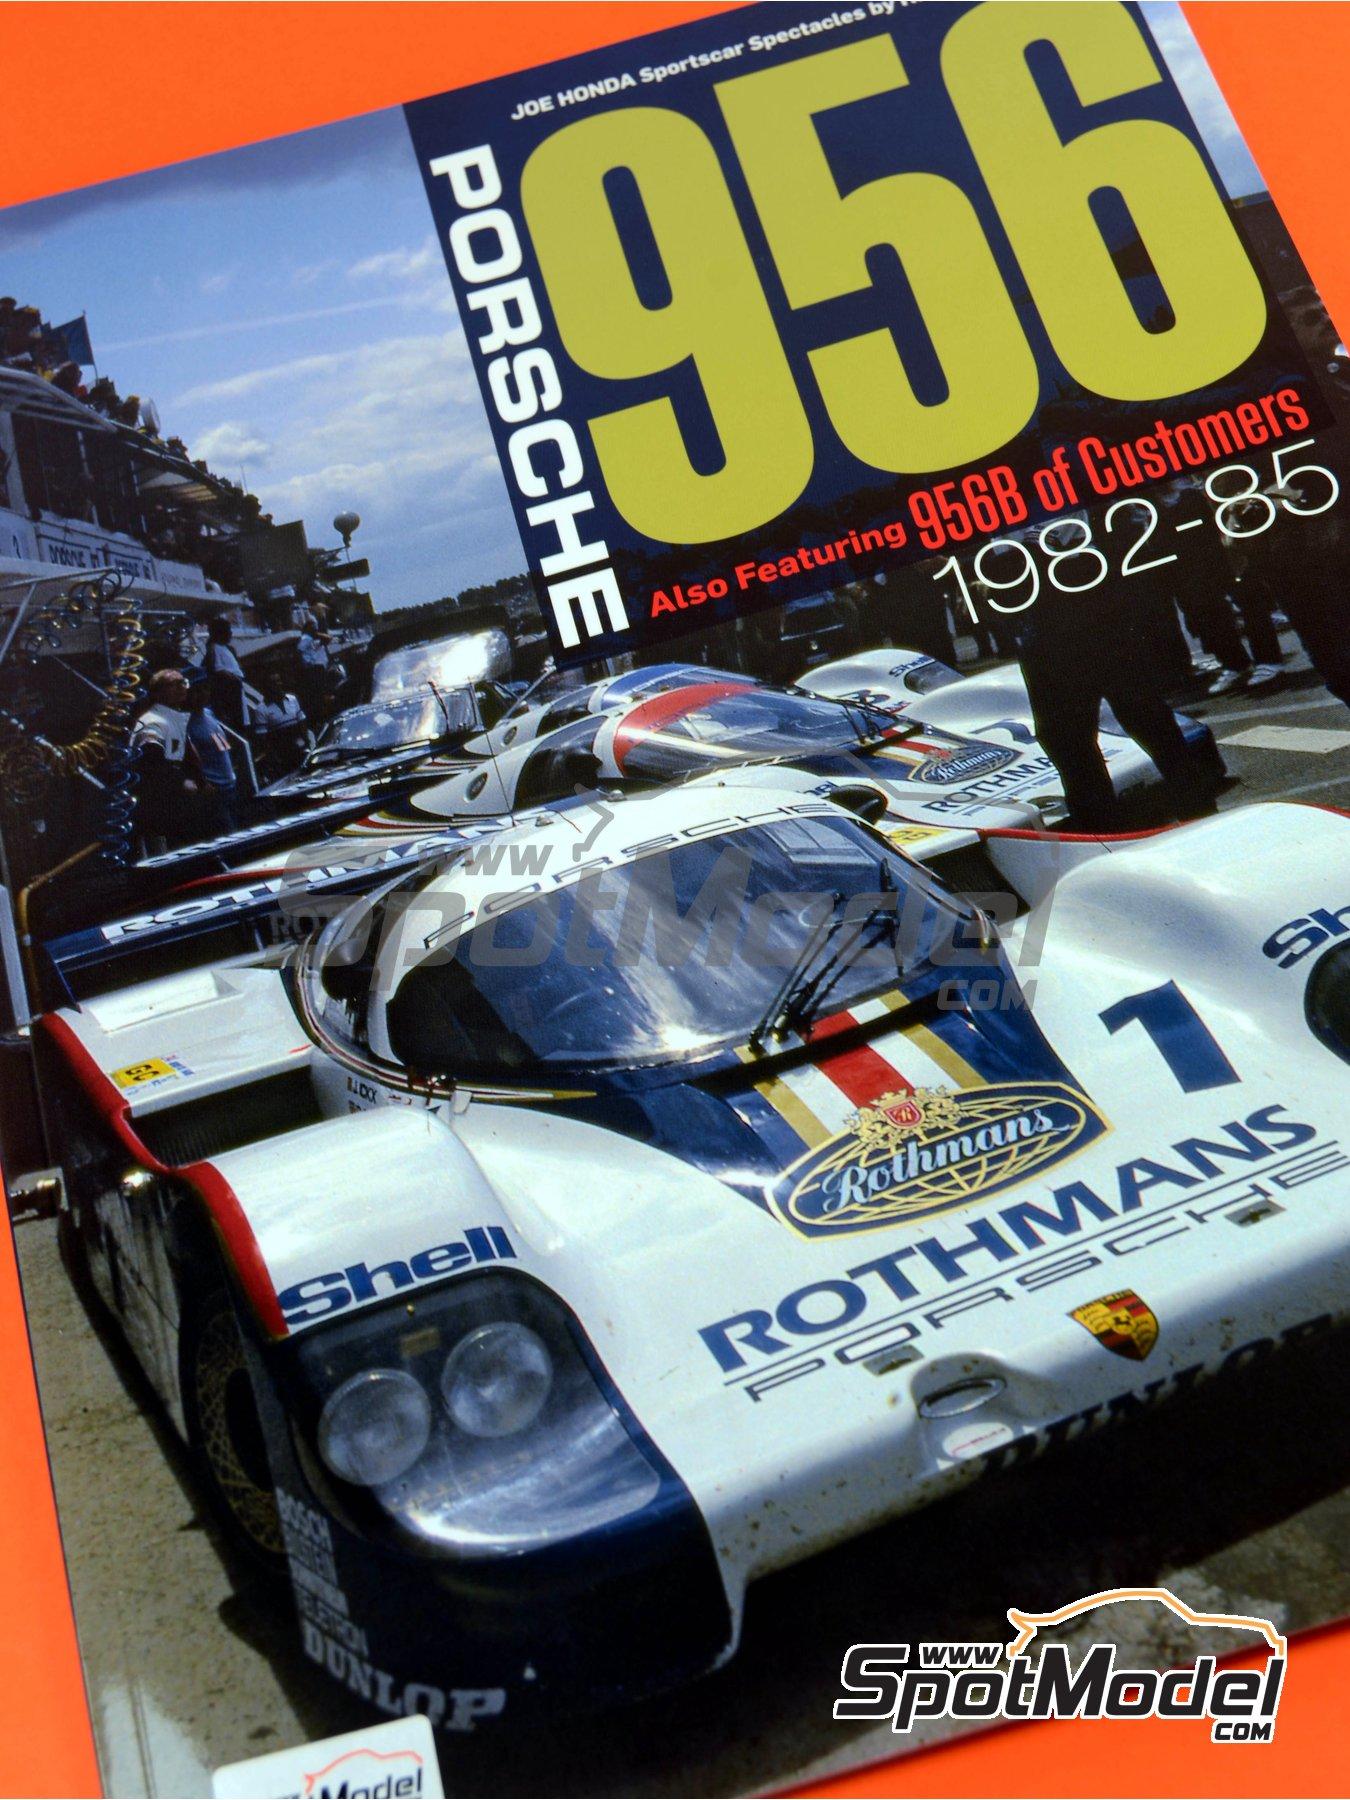 Joe Honda Sportscar Spectacles - Porsche 956 - 24 Horas de Le Mans, 1000 Kilómetros de Suzuka, 6 Horas de Silverstone, 6 Horas de Fuji 1982, 1983, 1984, 1985 y 1985 | Libro de referencia fabricado por Model Factory Hiro (ref.MFH-SS007) image